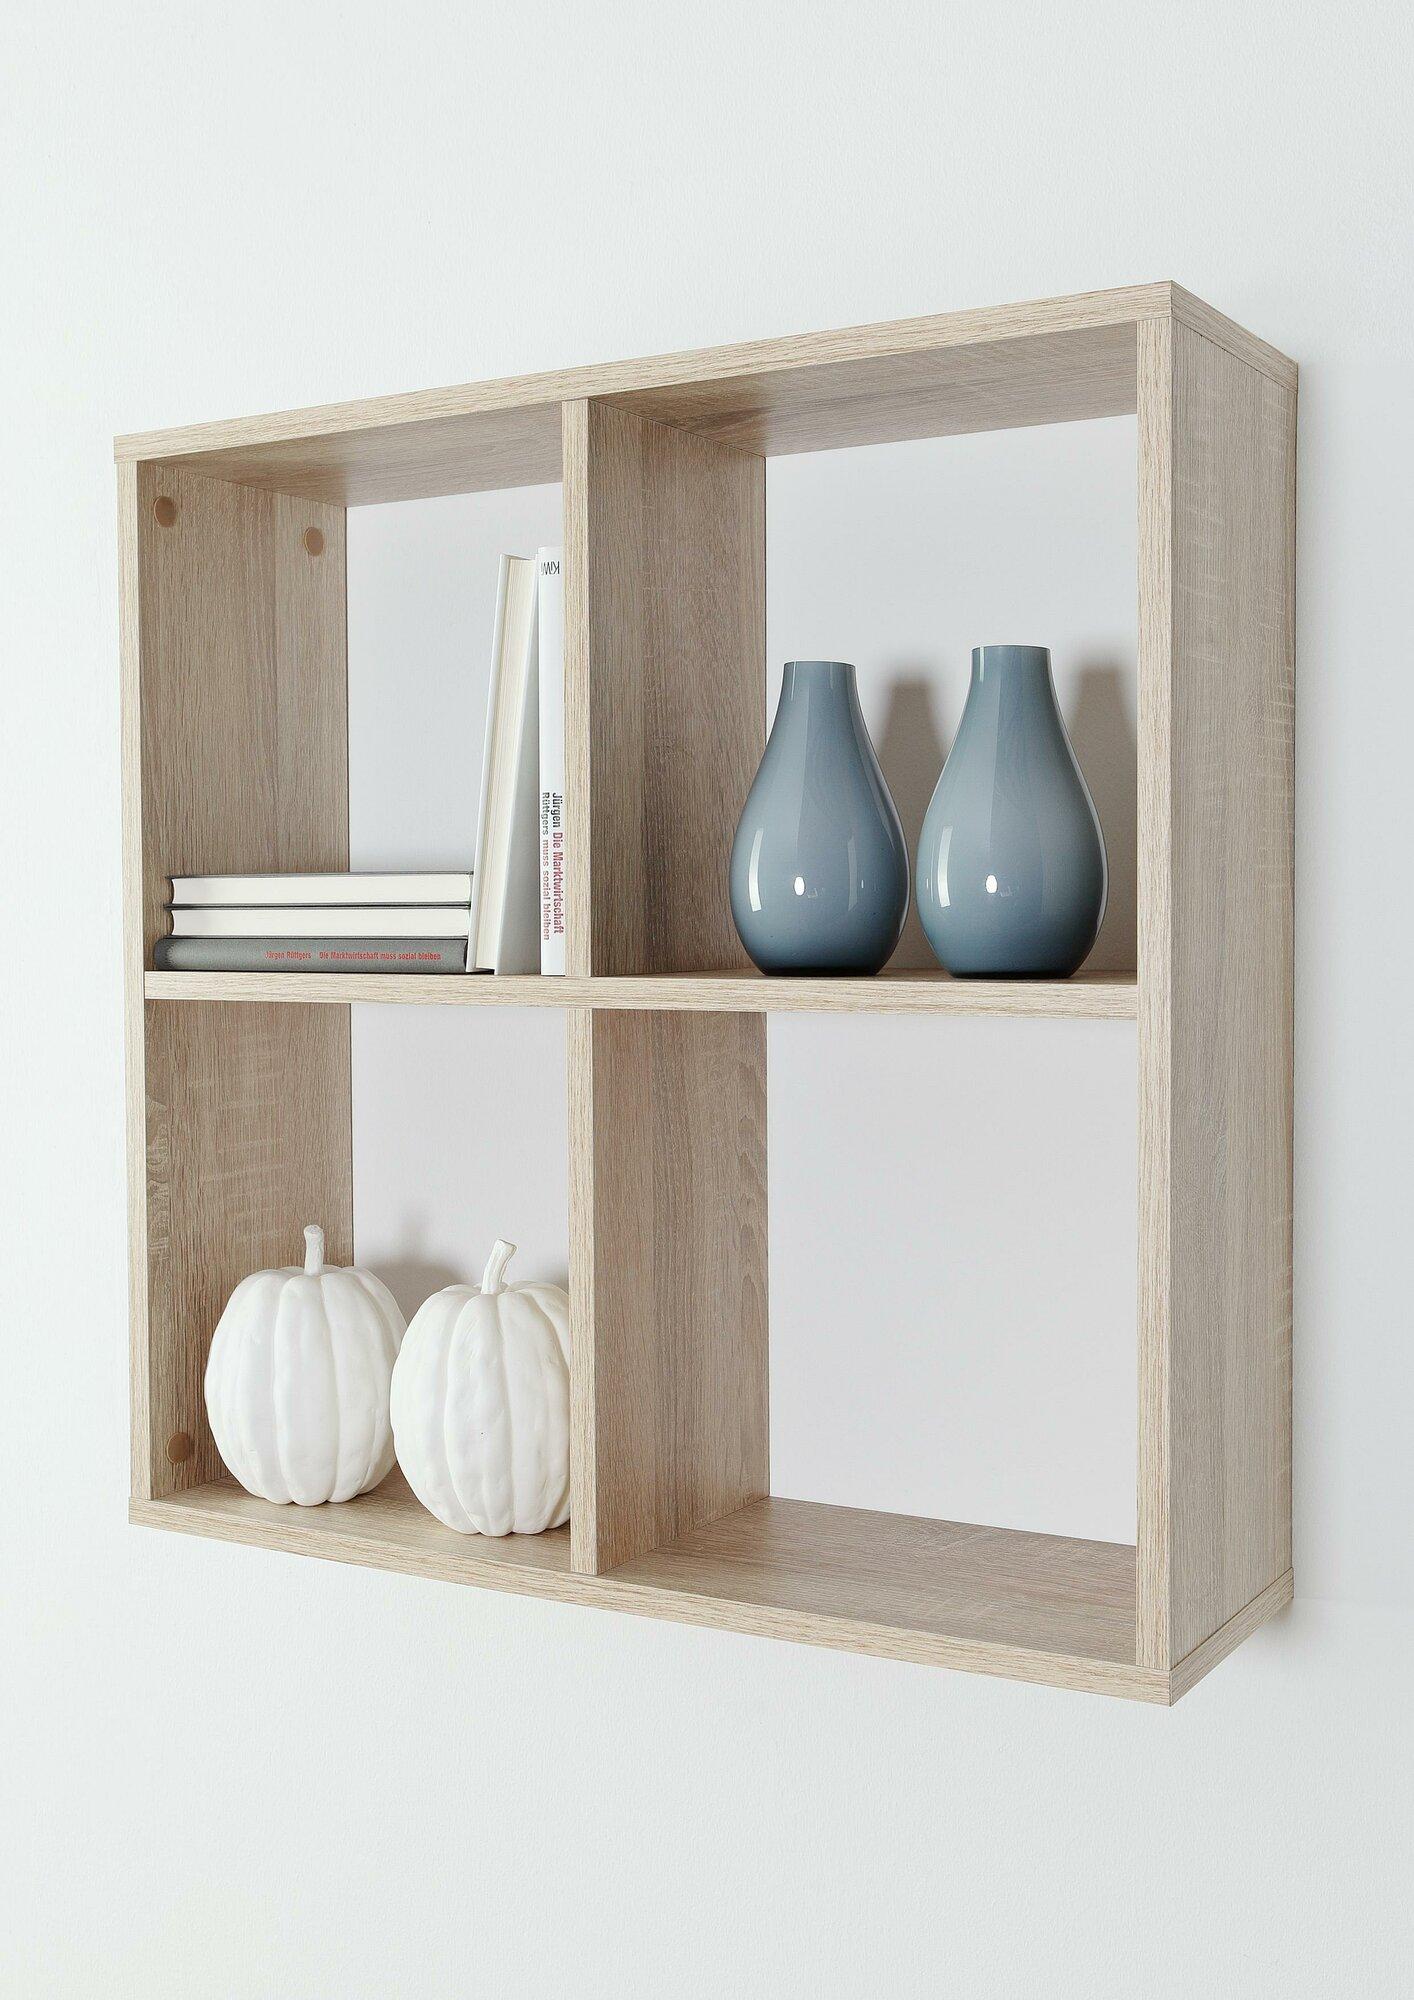 hela tische wandregal ken mit 4 f chern ebay. Black Bedroom Furniture Sets. Home Design Ideas